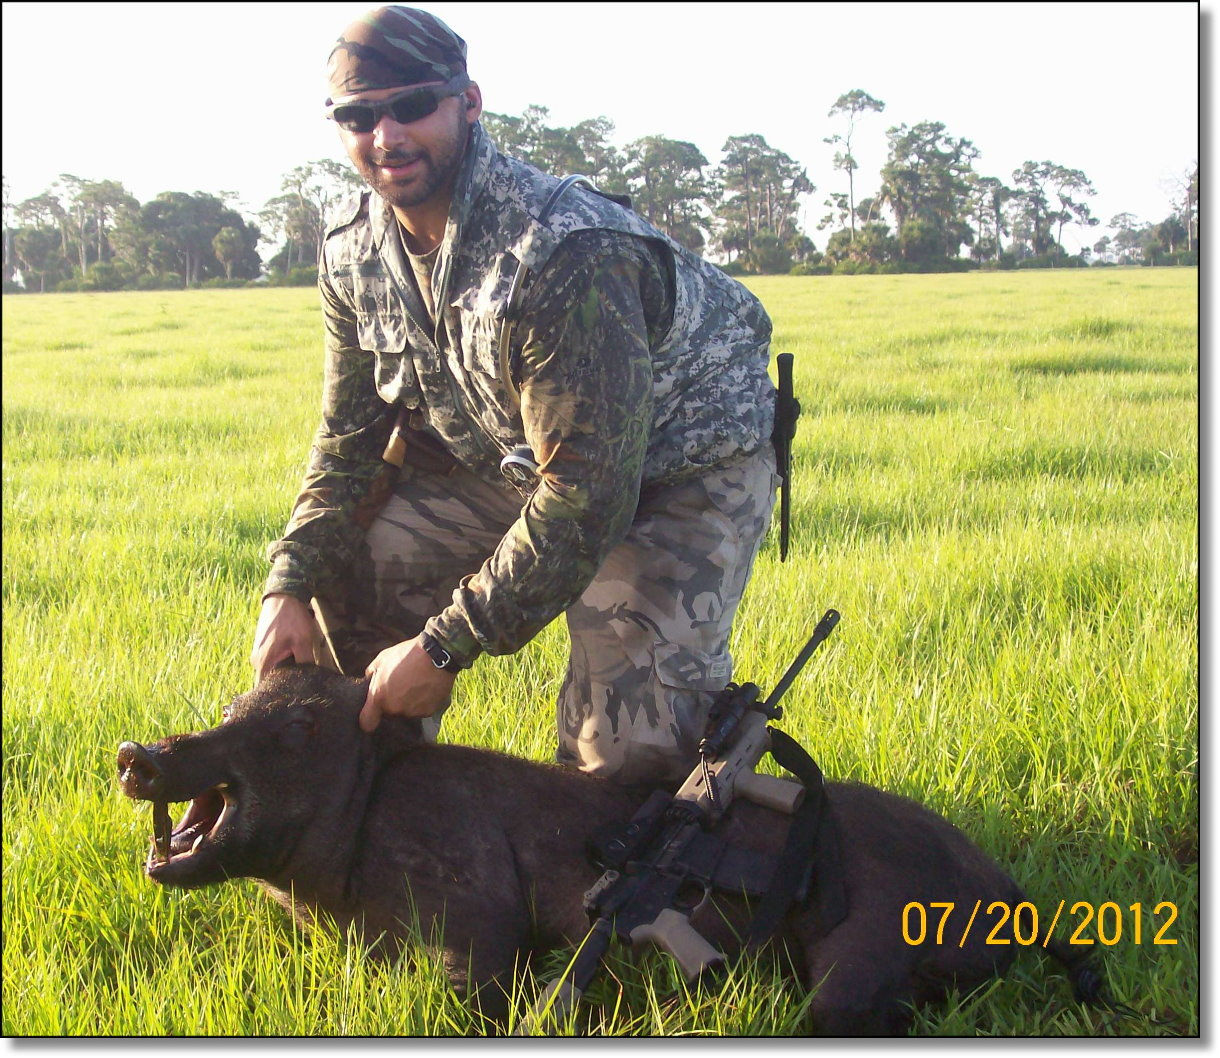 Drt Frangible 223 Ammo Vs Charging Wild Boar Gunsamerica Digest